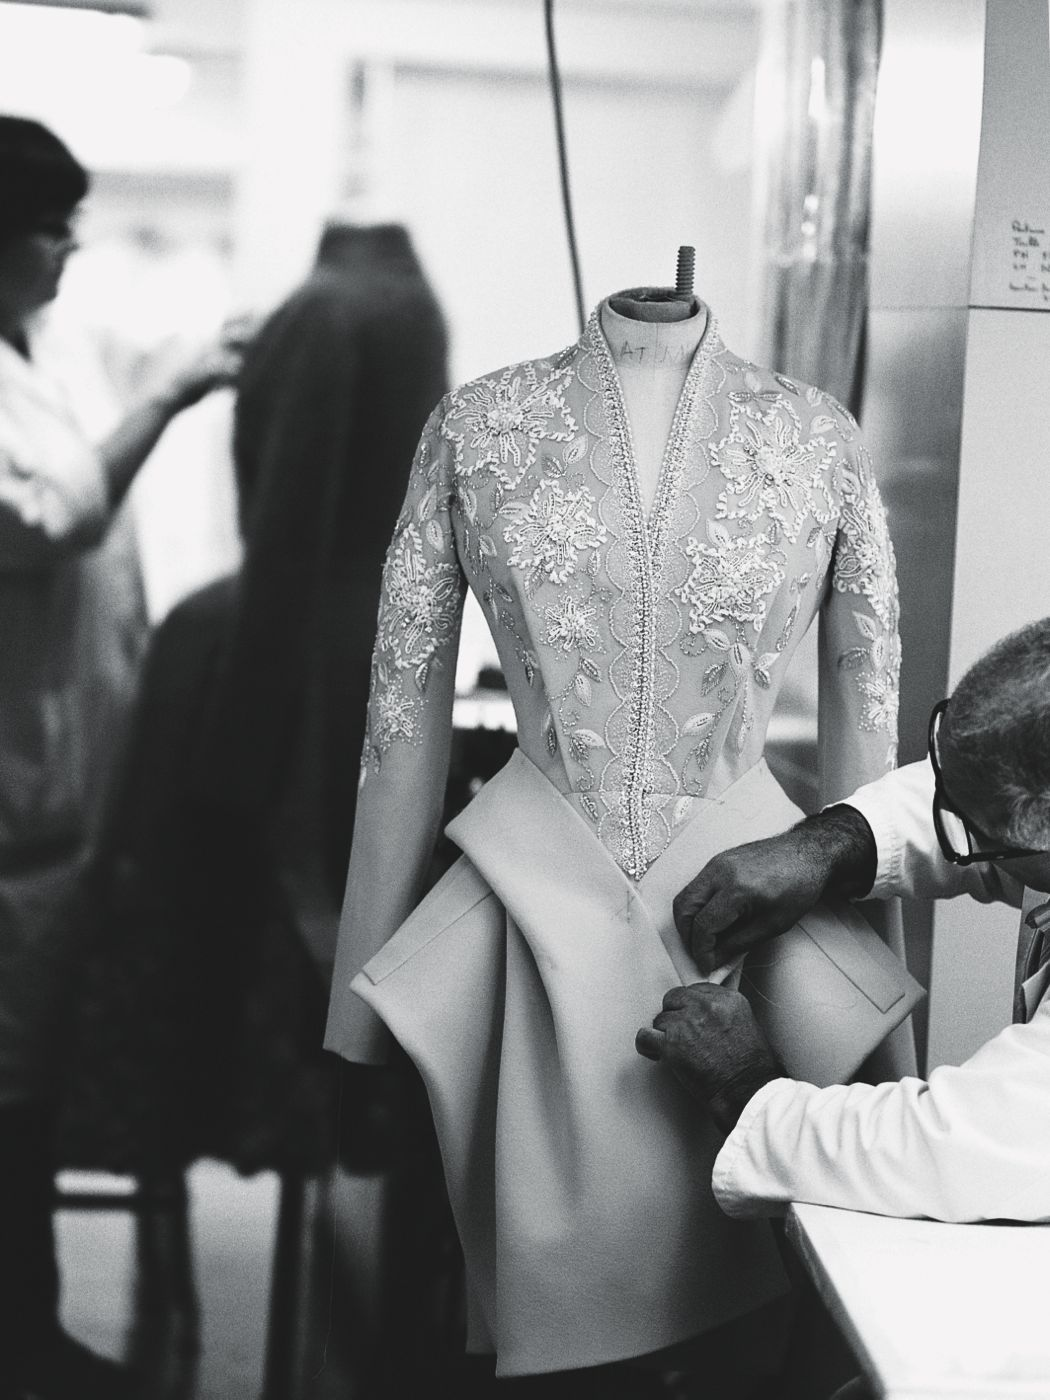 Les journ es particuli res the skinny beep - Chambre de la haute couture ...